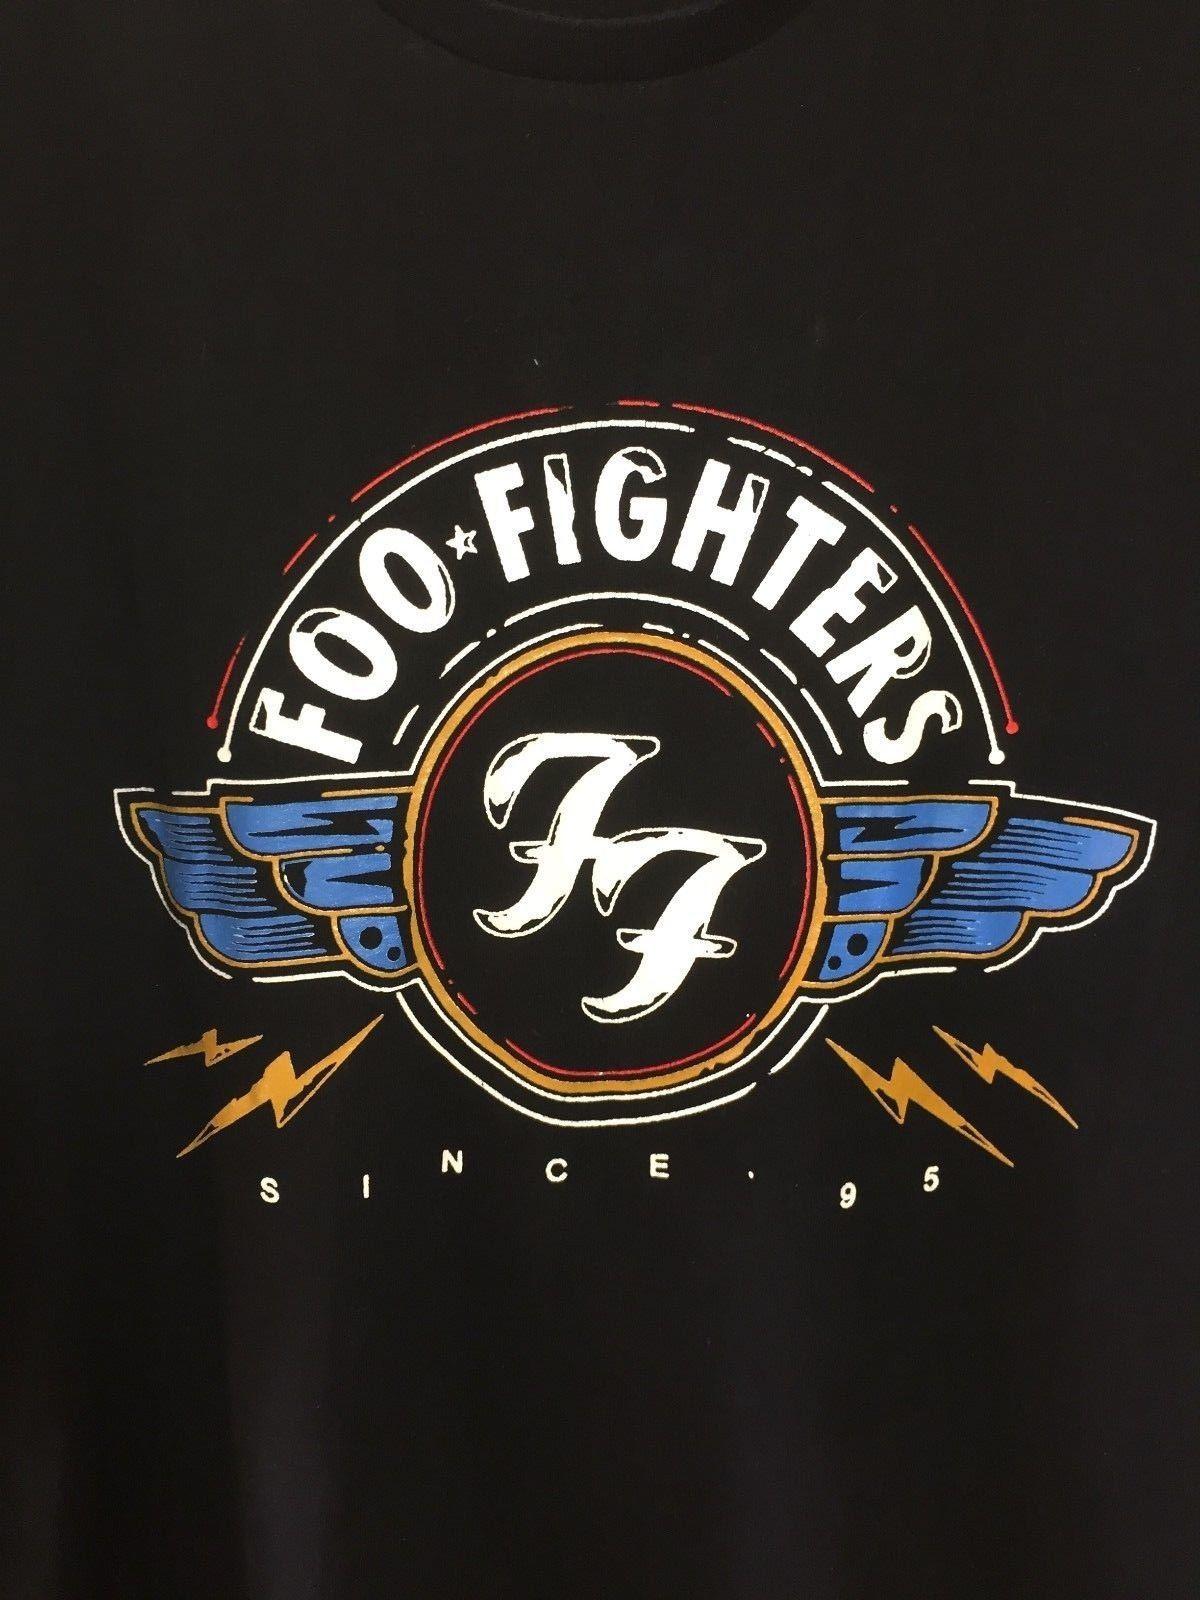 Moda Envío Gratis Hombre Negro Foo Mujeres Fighters Unisex Grande Extra Camiseta Hombres qGjUVLSMzp